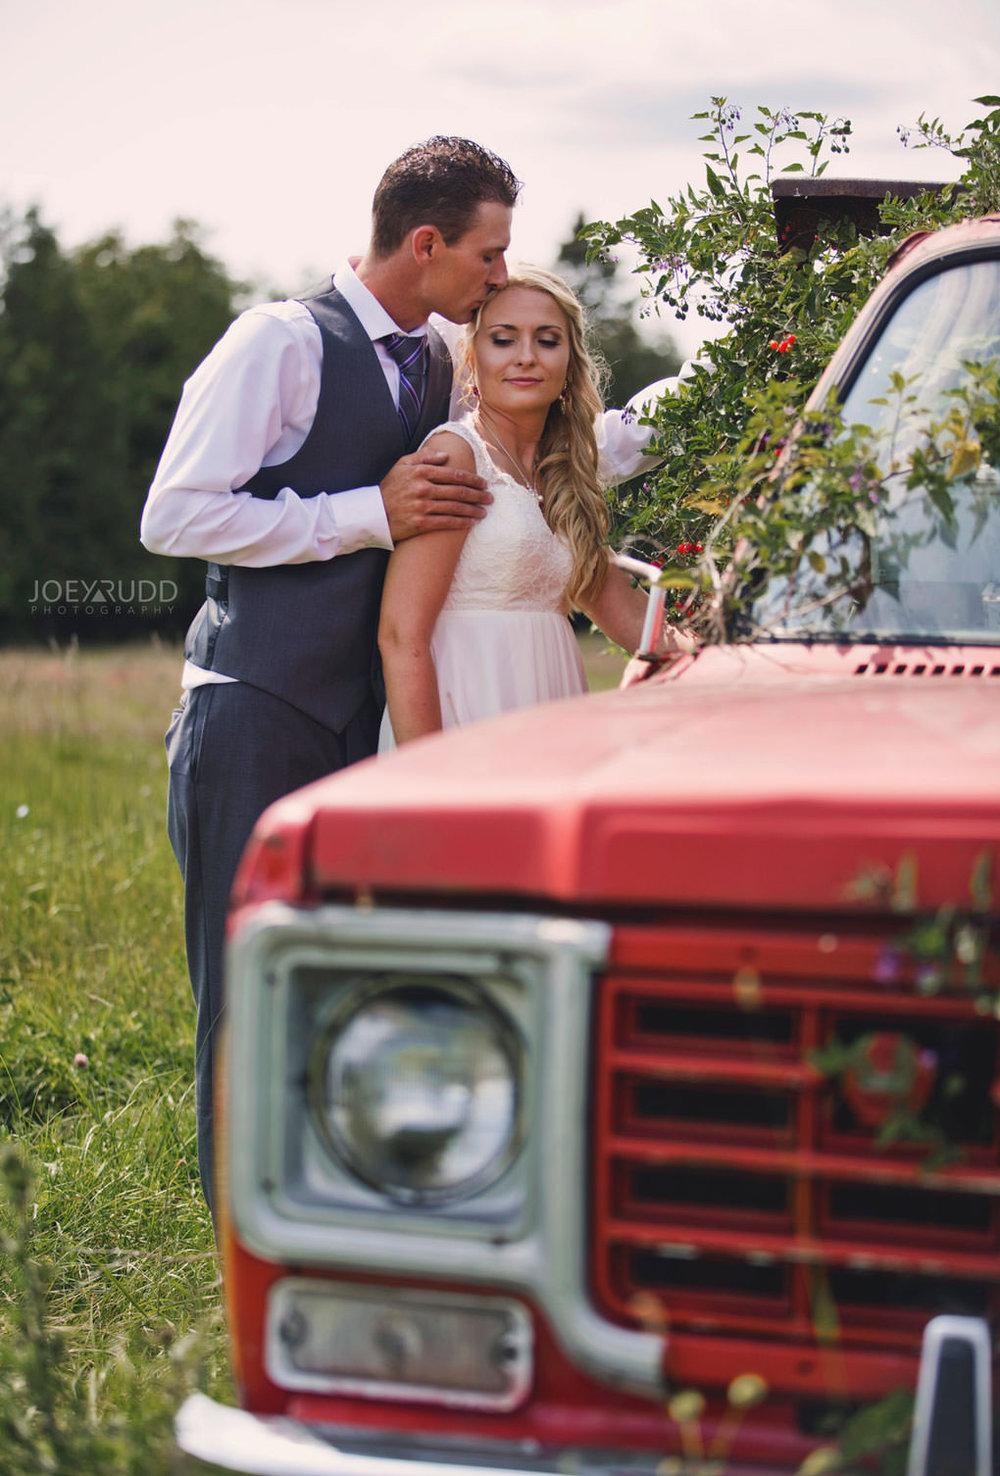 Ottawa Wedding Photography by Ottawa Wedding Photographer Joey Rudd Photography Elopement Carleton Place Smiths Falls Ontario Rustic Old Truck Pose